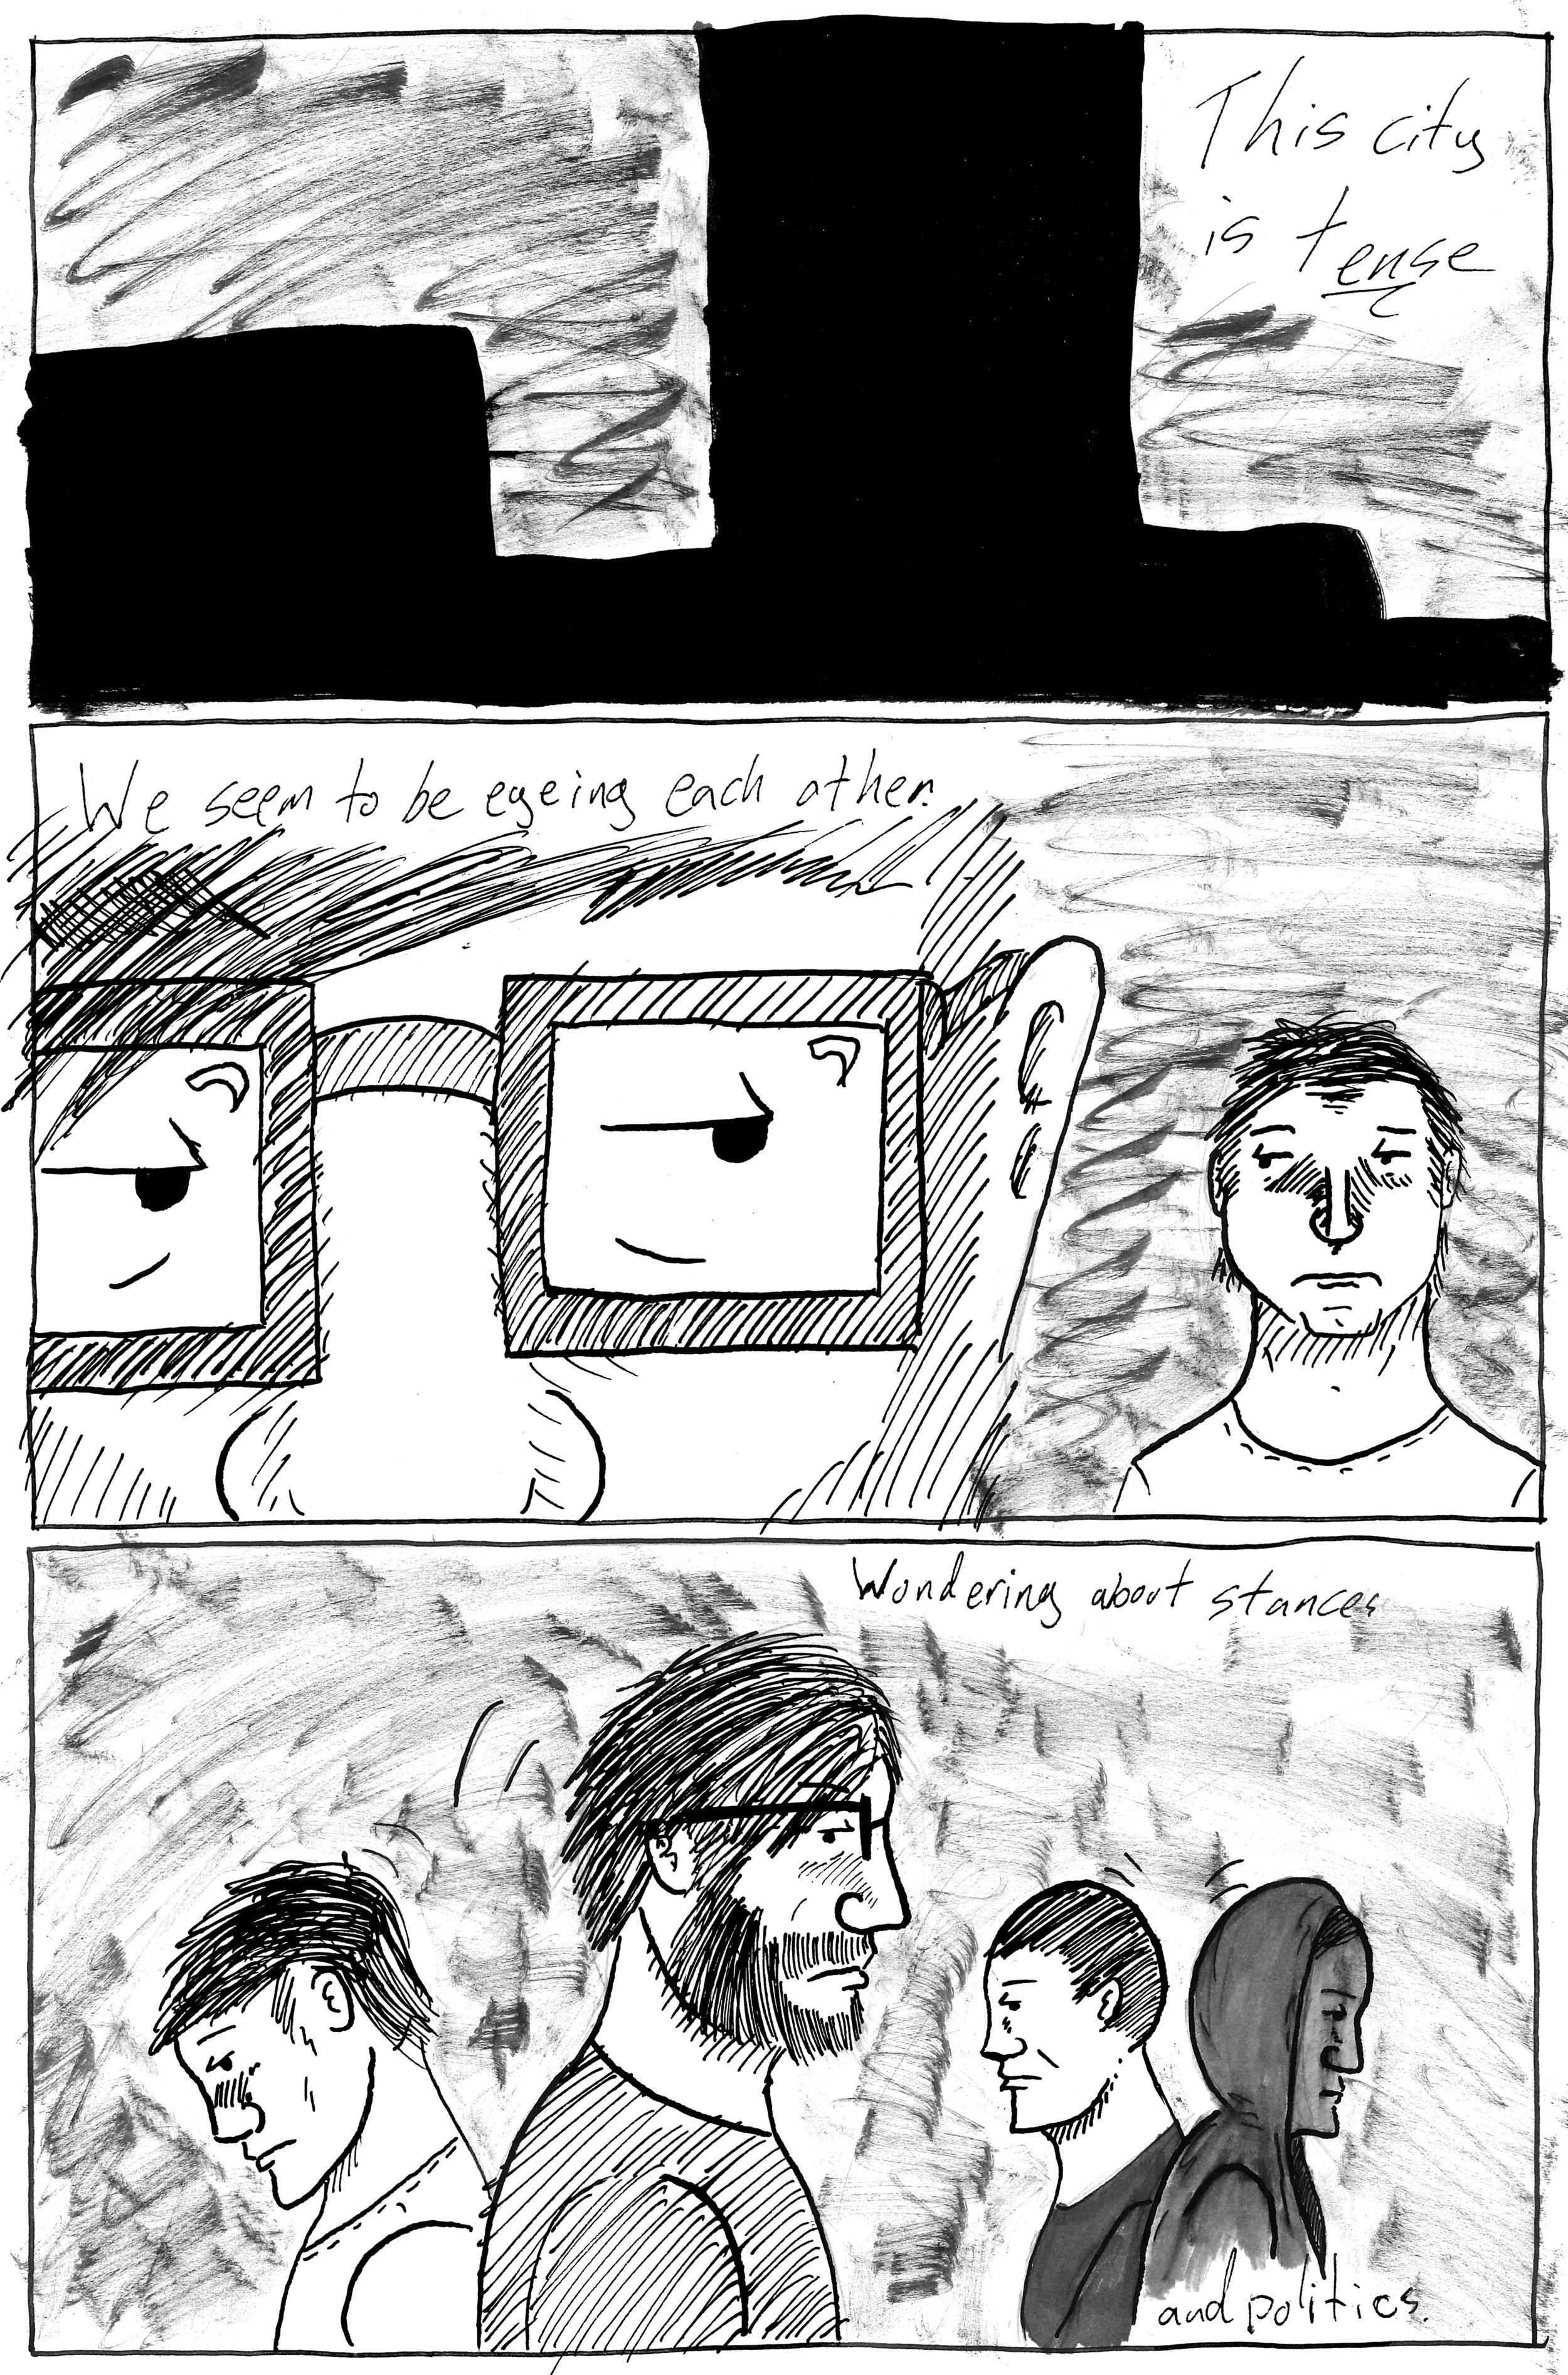 6page4 copy.jpg